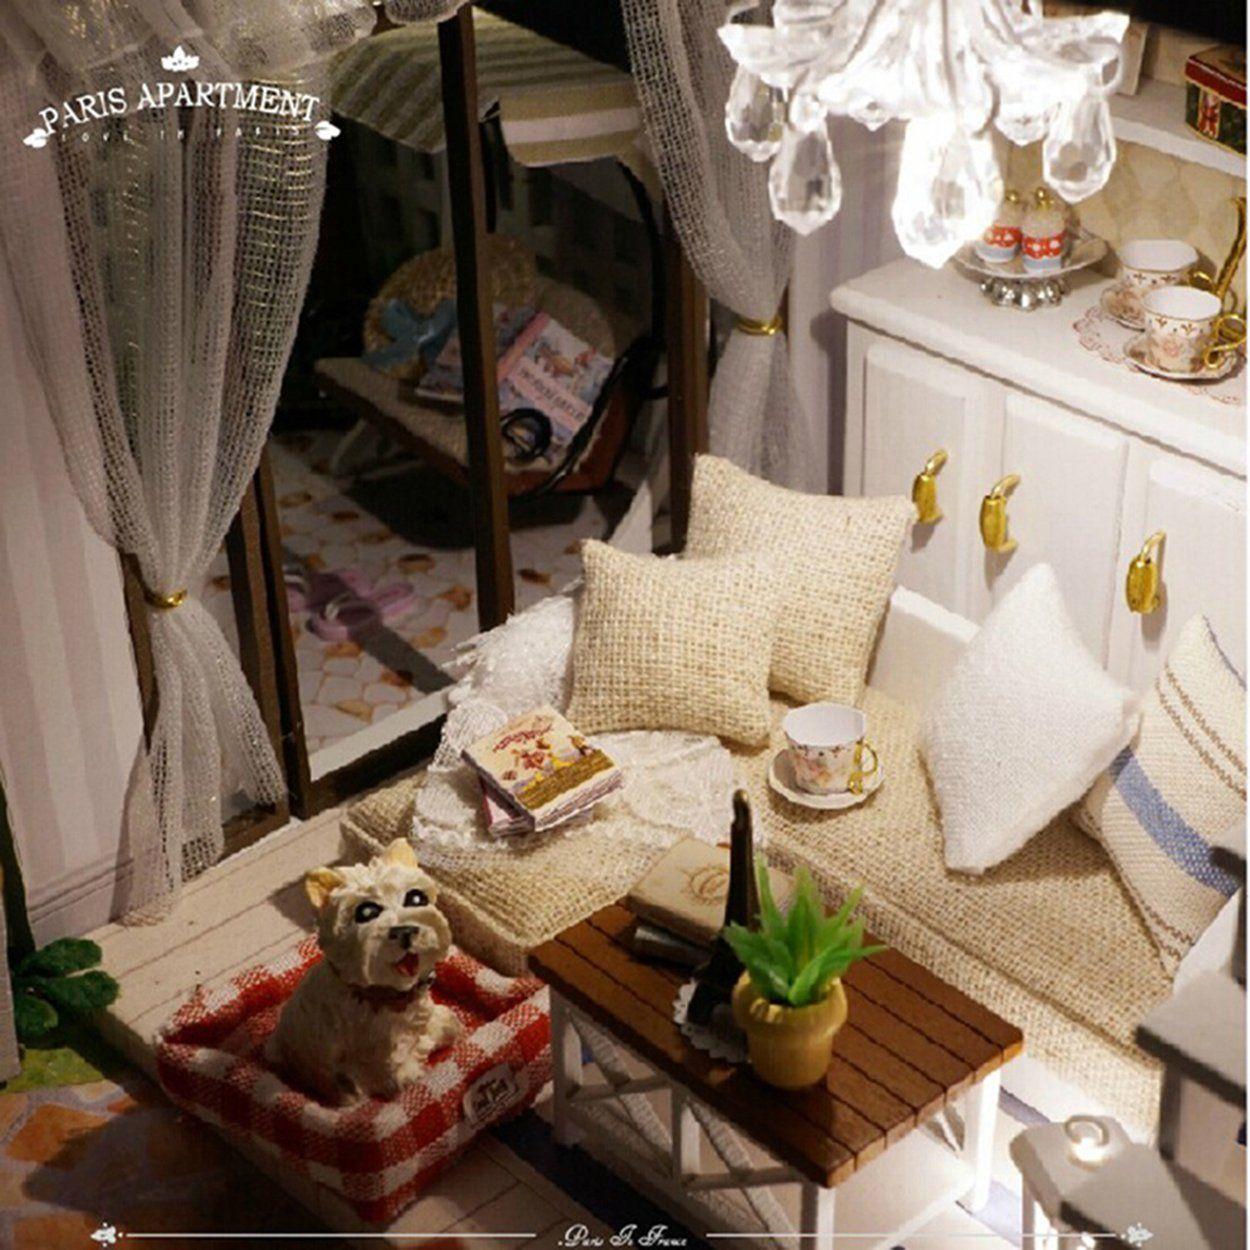 dollhouse miniature furniture. Amazon.com: Rylai Wooden Handmade Dollhouse Miniature DIY Kit - Paris Apartment Dollhouses Furniture